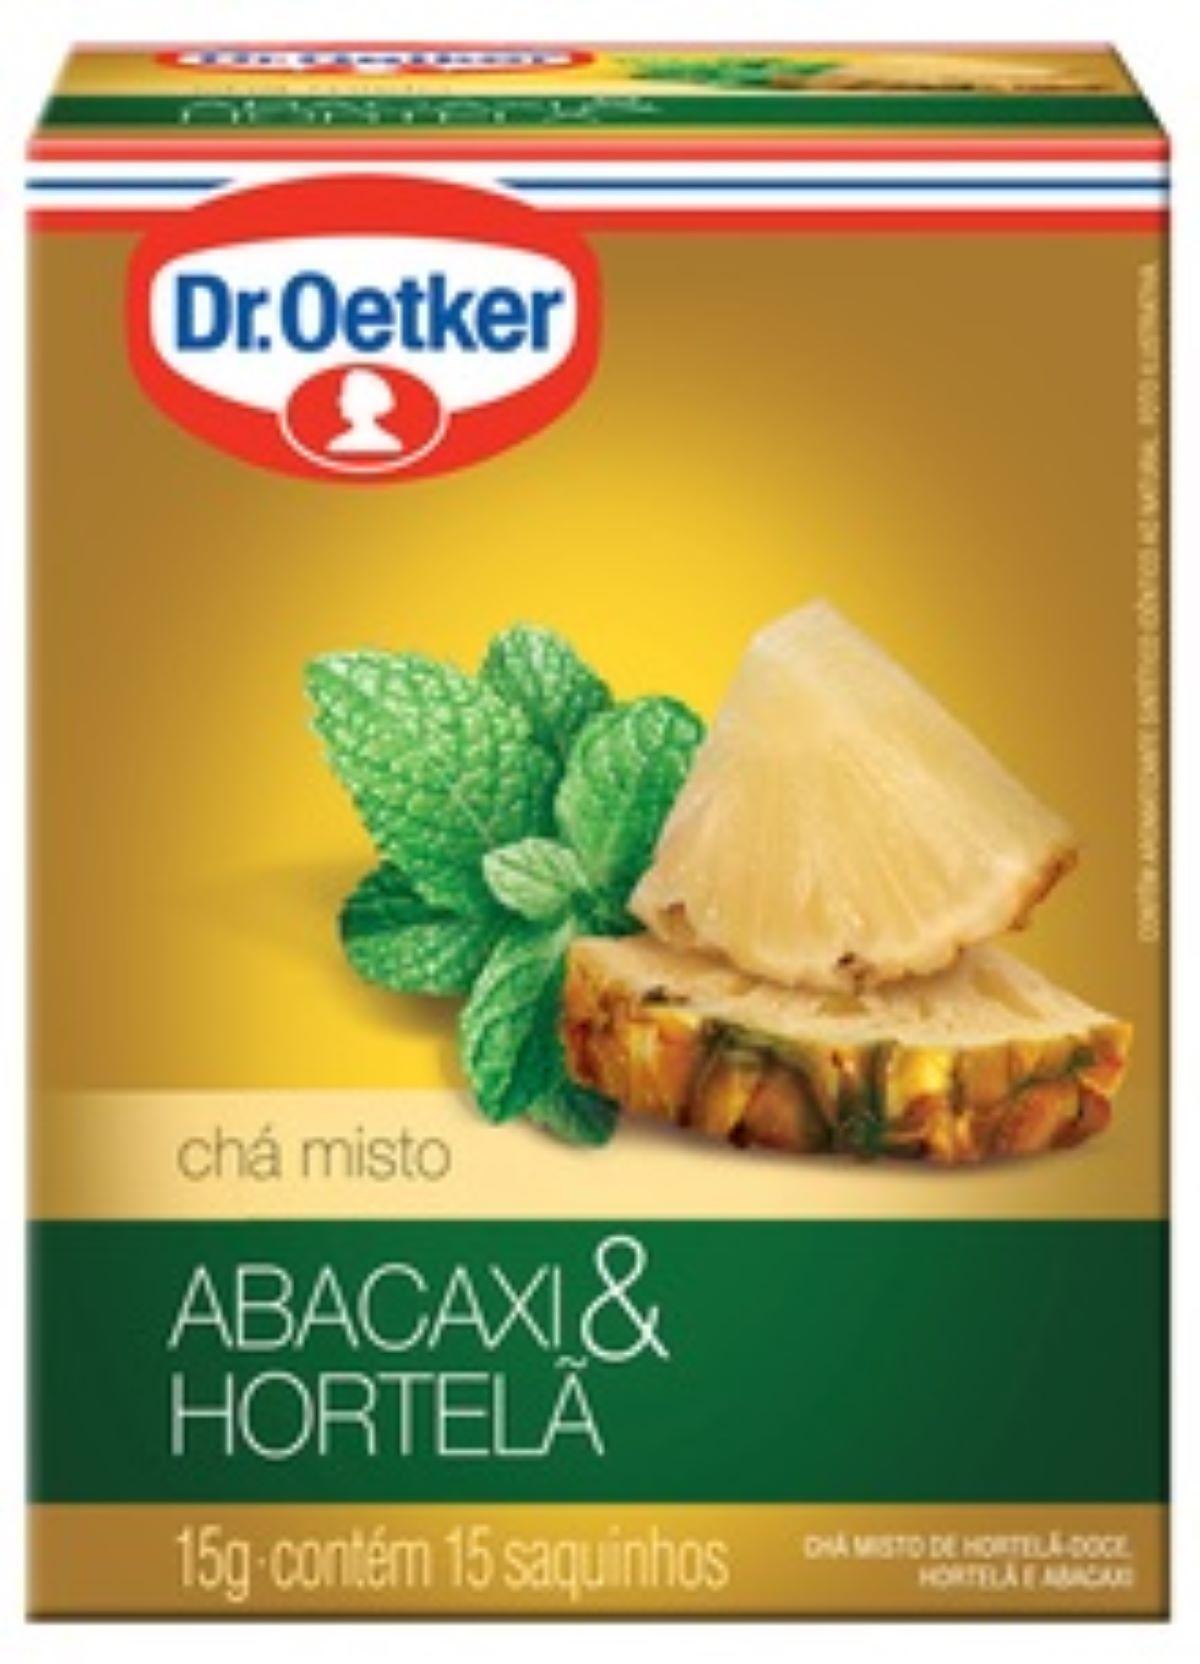 CHÁ ABACAXI COM HORTELÃ DR. OETKER